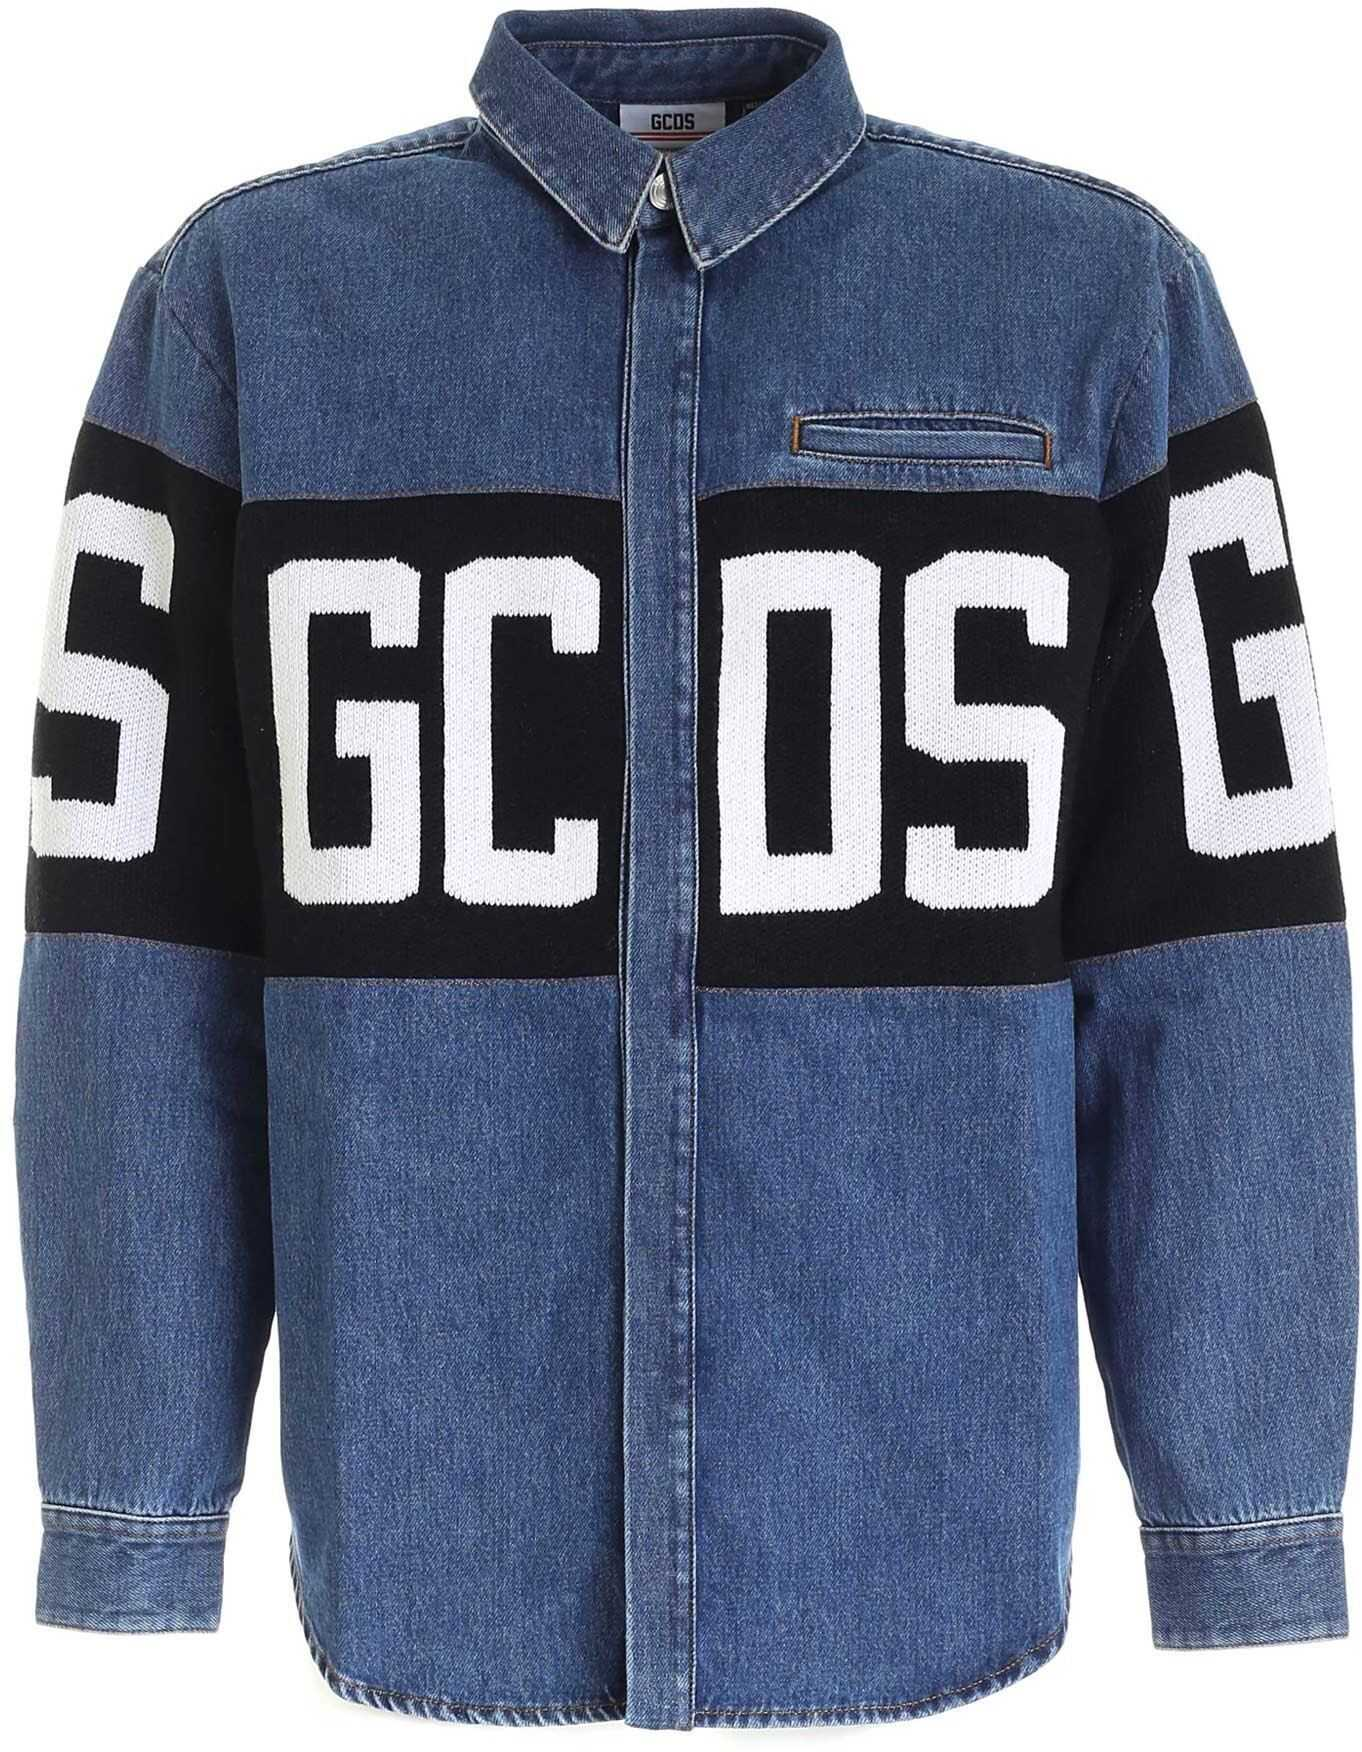 GCDS Maxi Logo Denim Shirt In Blue Blue imagine